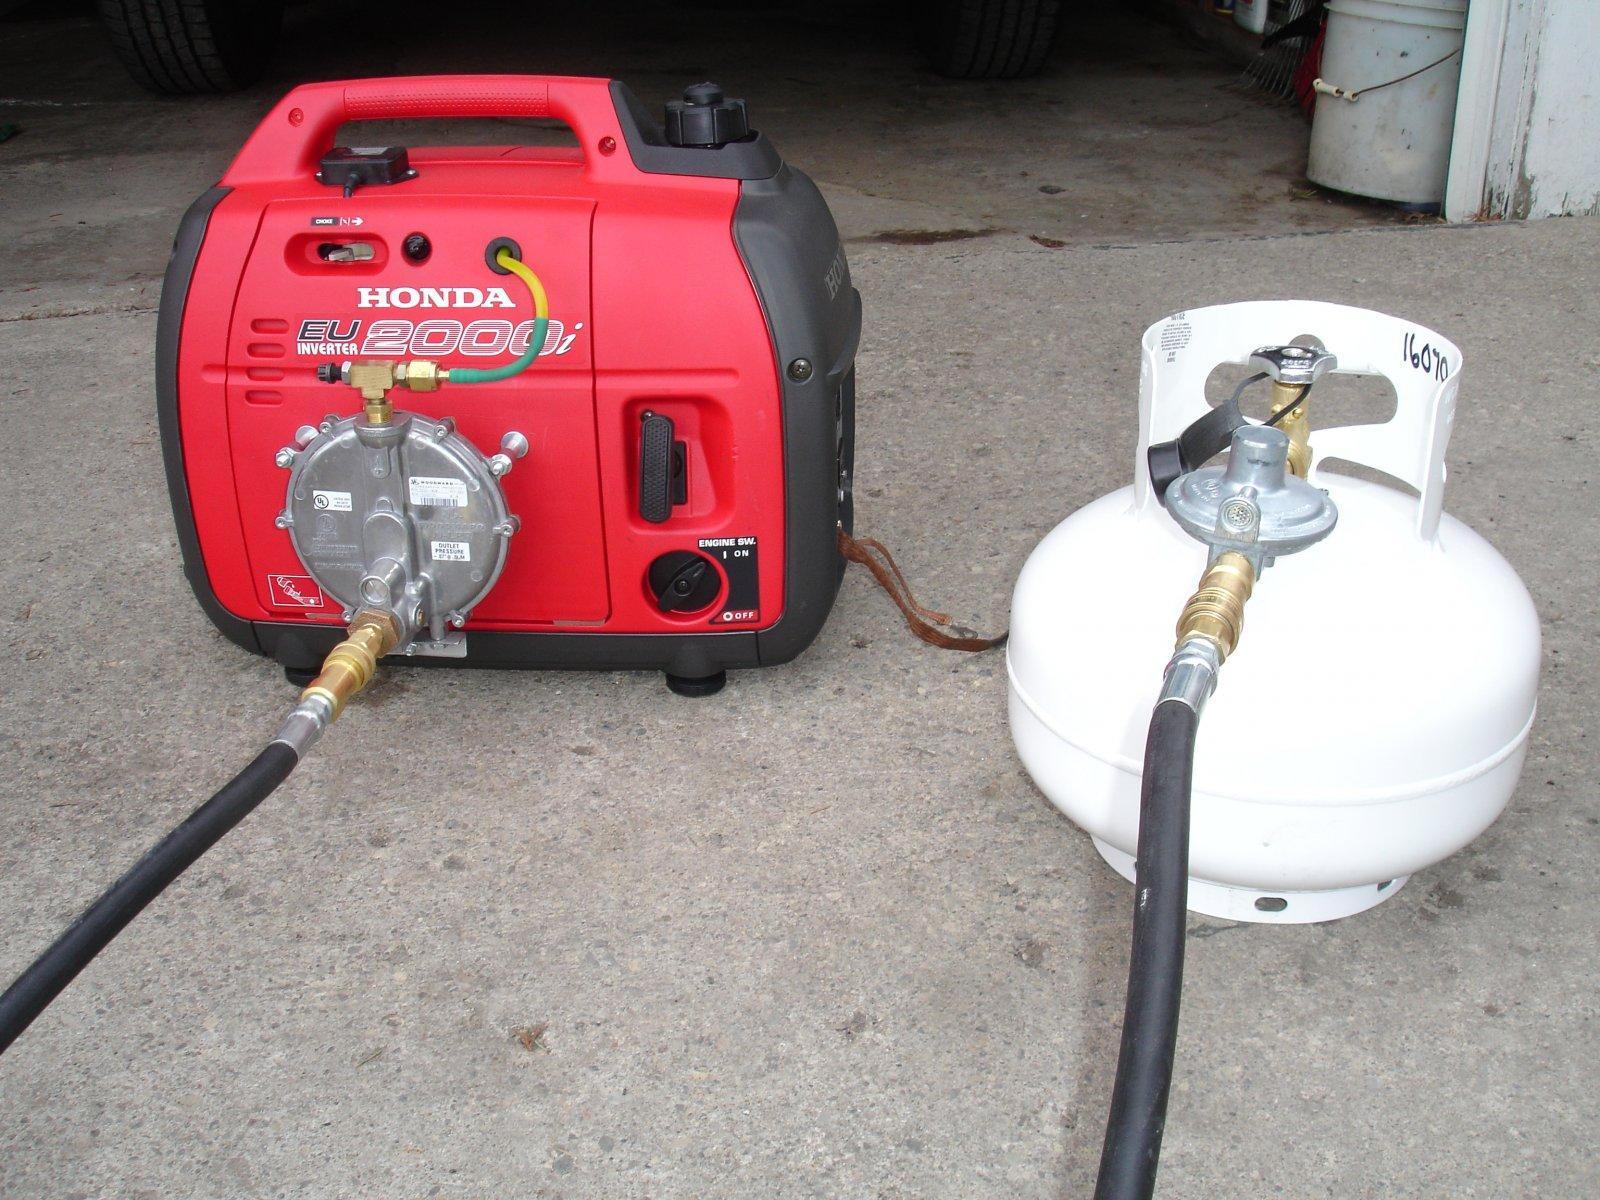 Honda Generator Parallel Kit Stuff T Ef1000is Inverter Wiring Diagram Click Image To Enlarge